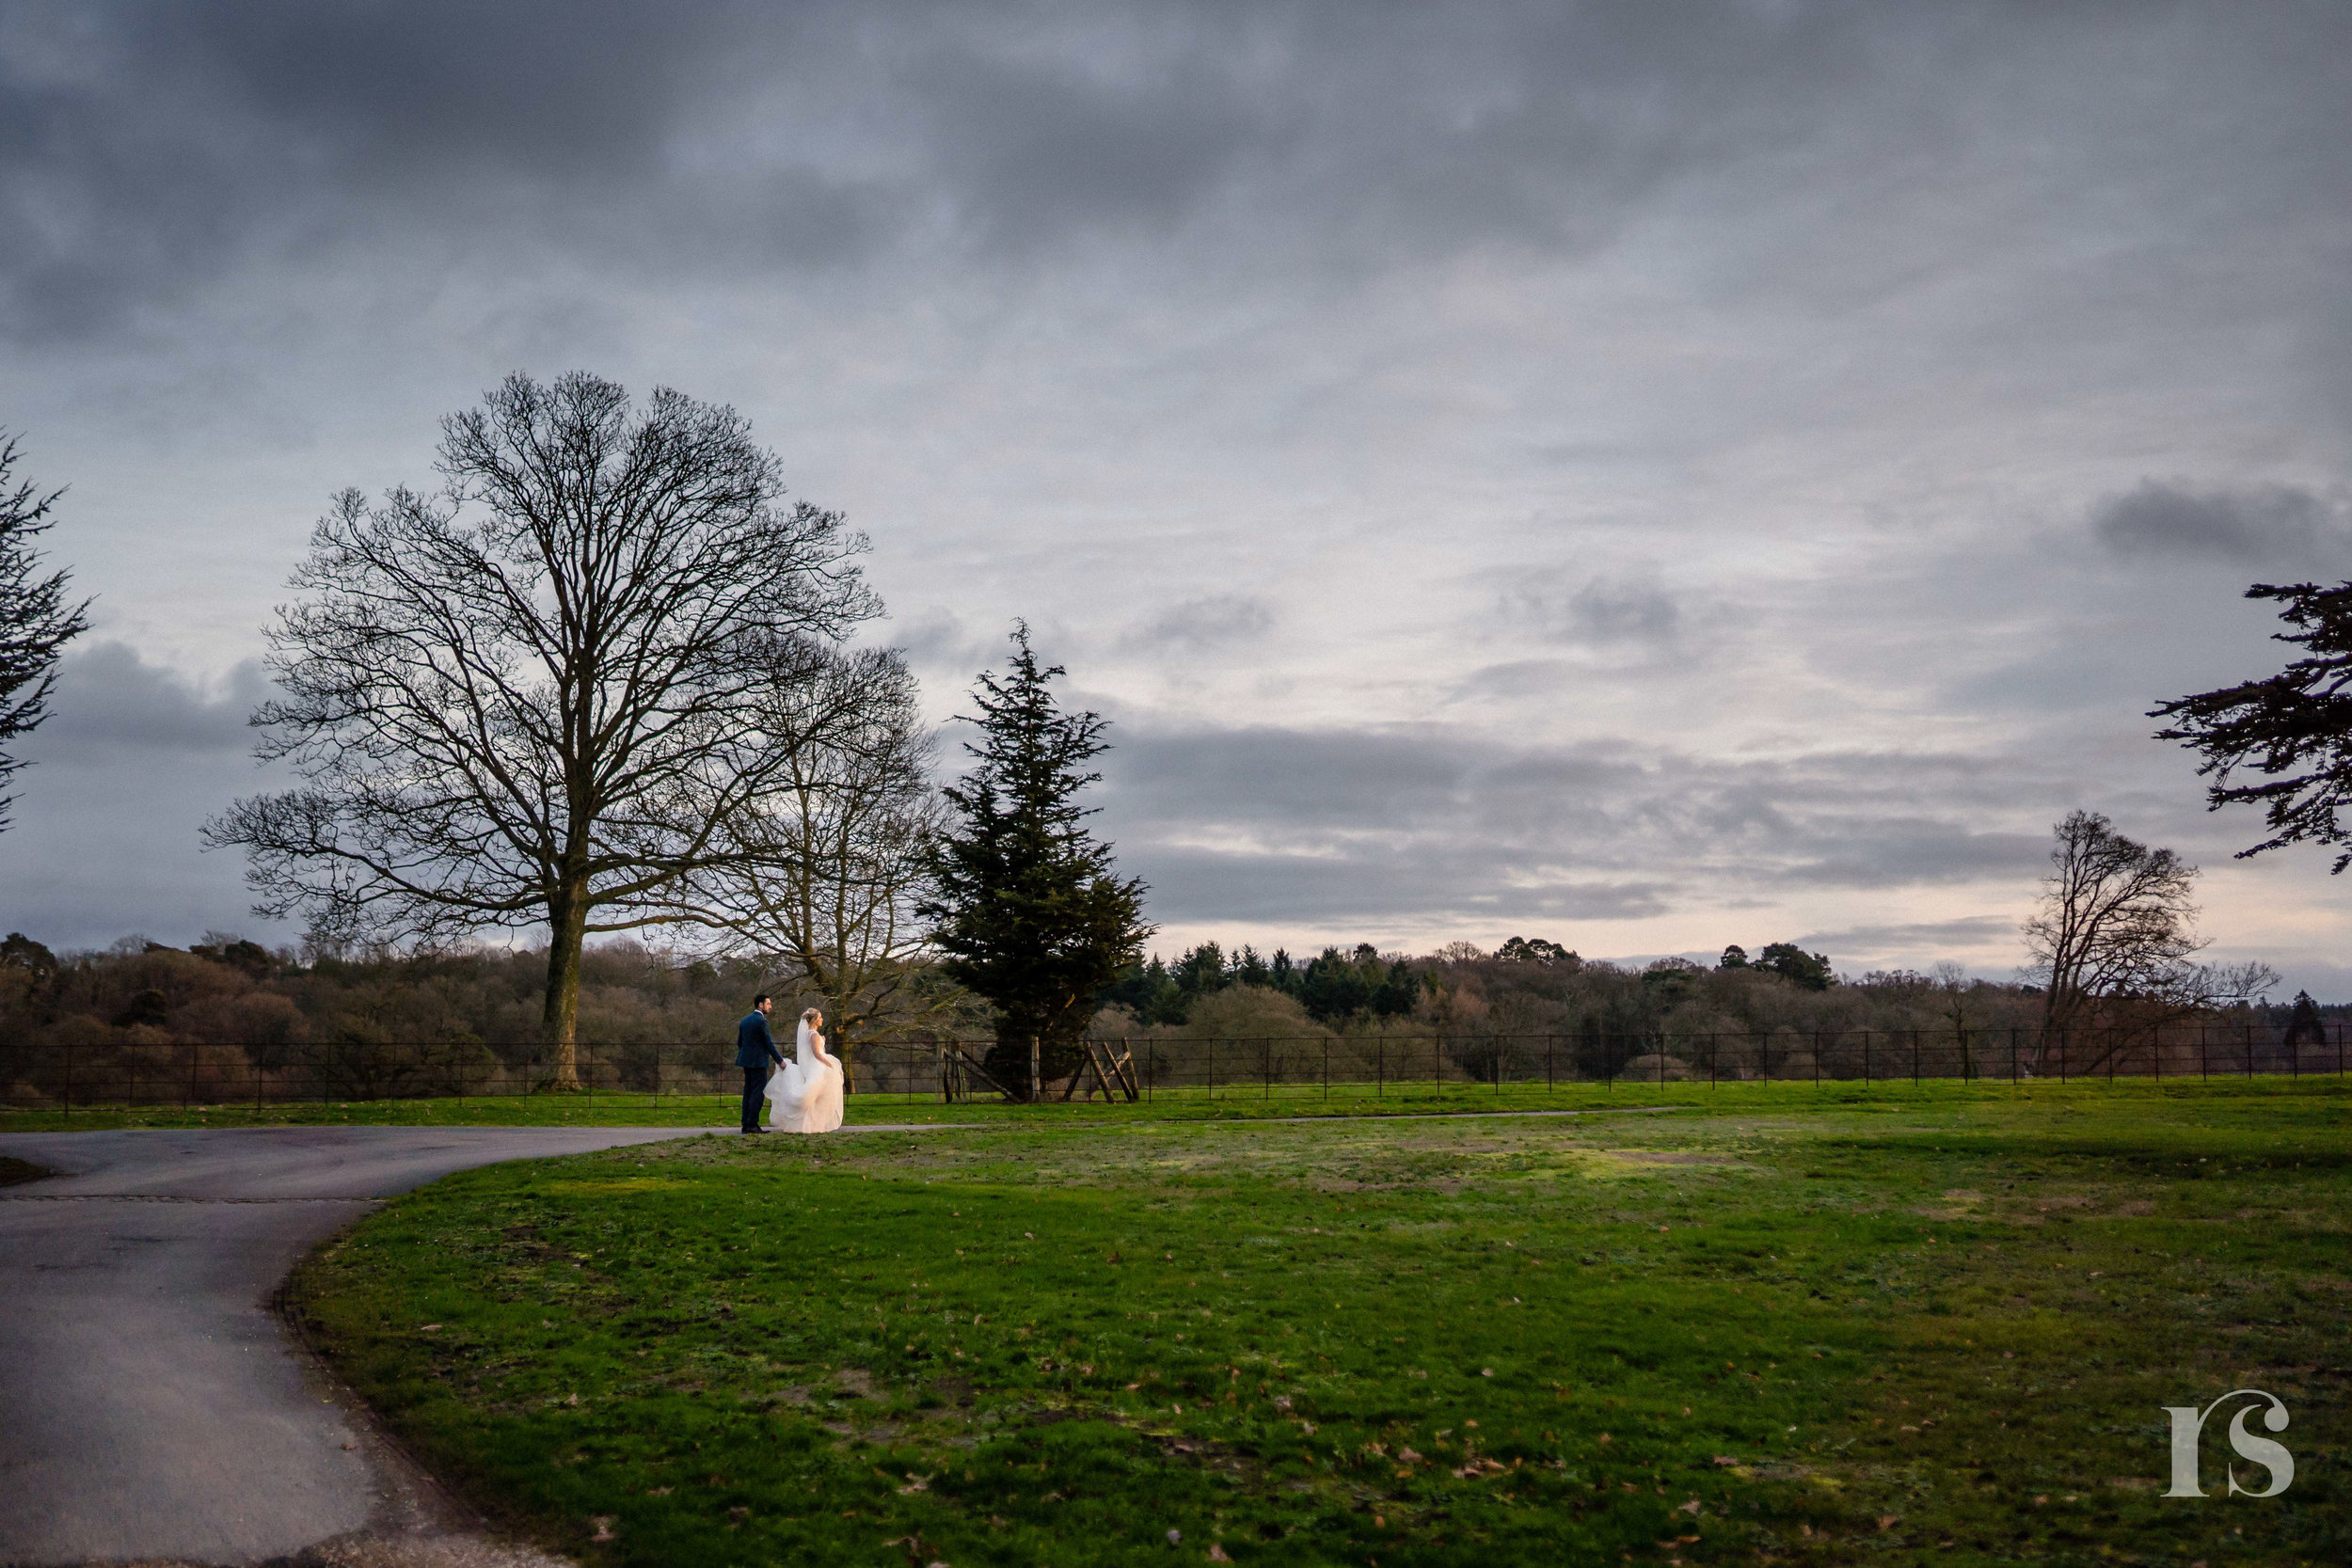 wasing-park-winter-wedding-59.jpg